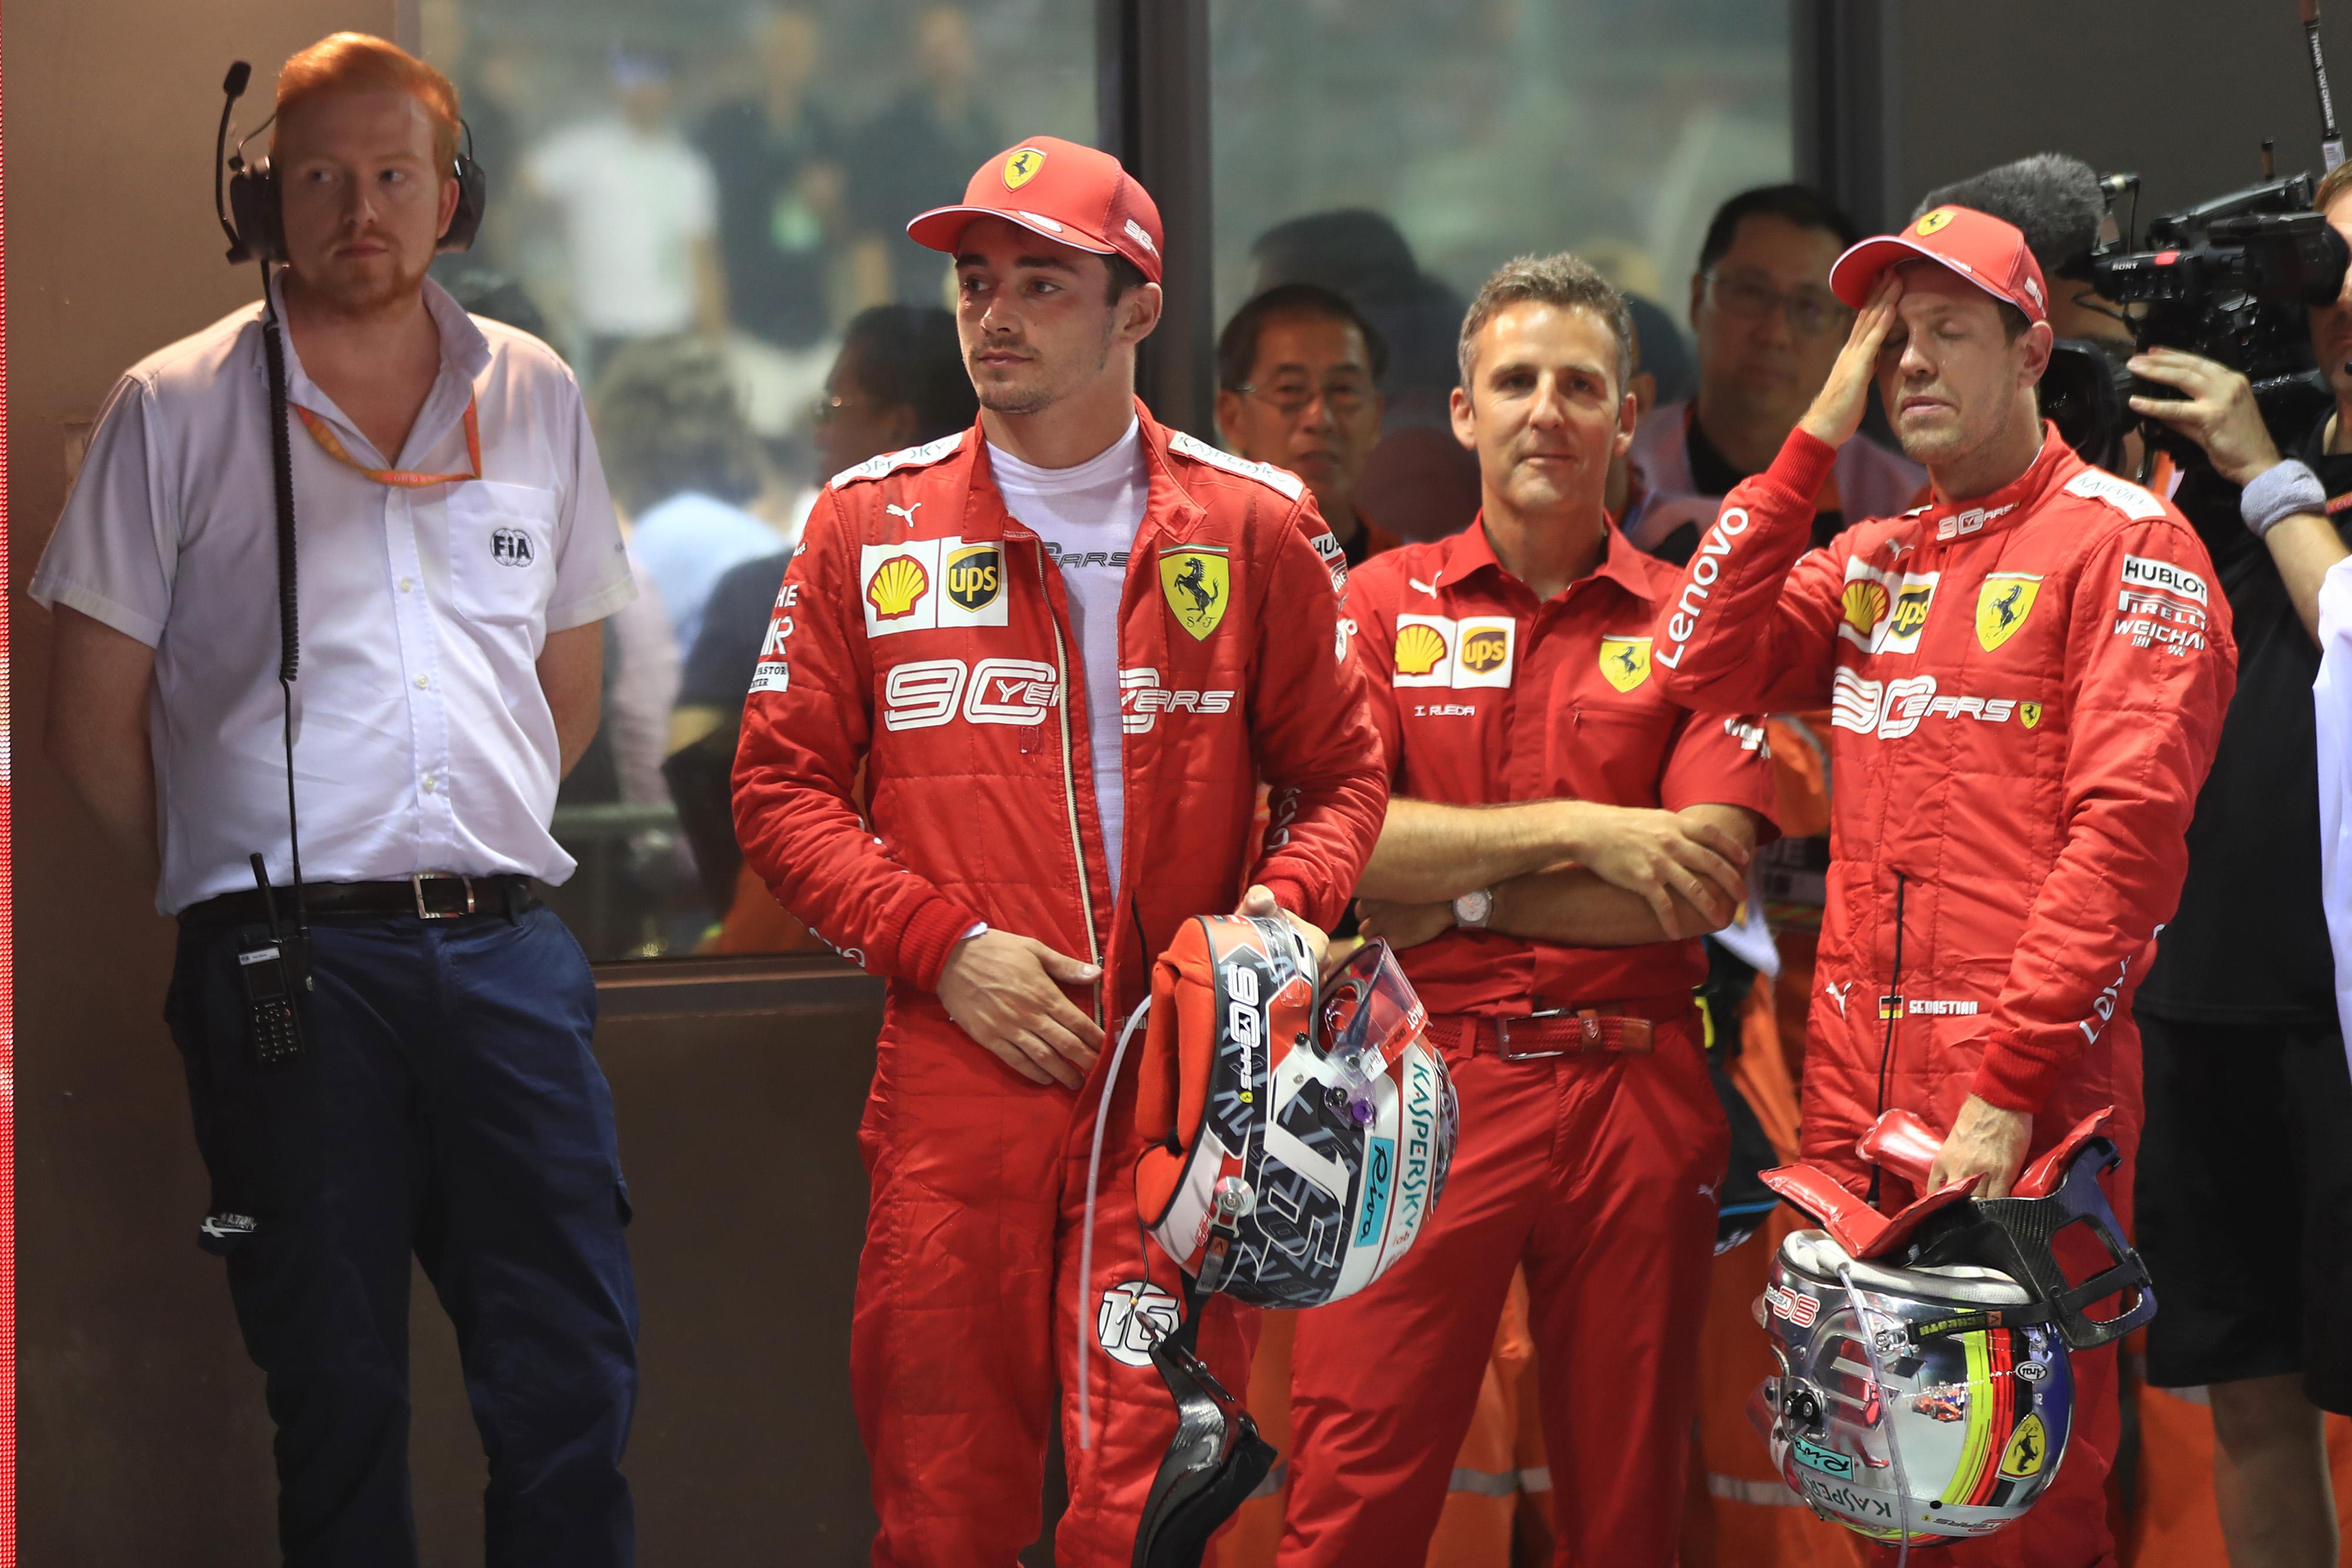 F1 Formula 1 Charles Leclerc Ferrari Sebastian Vettel